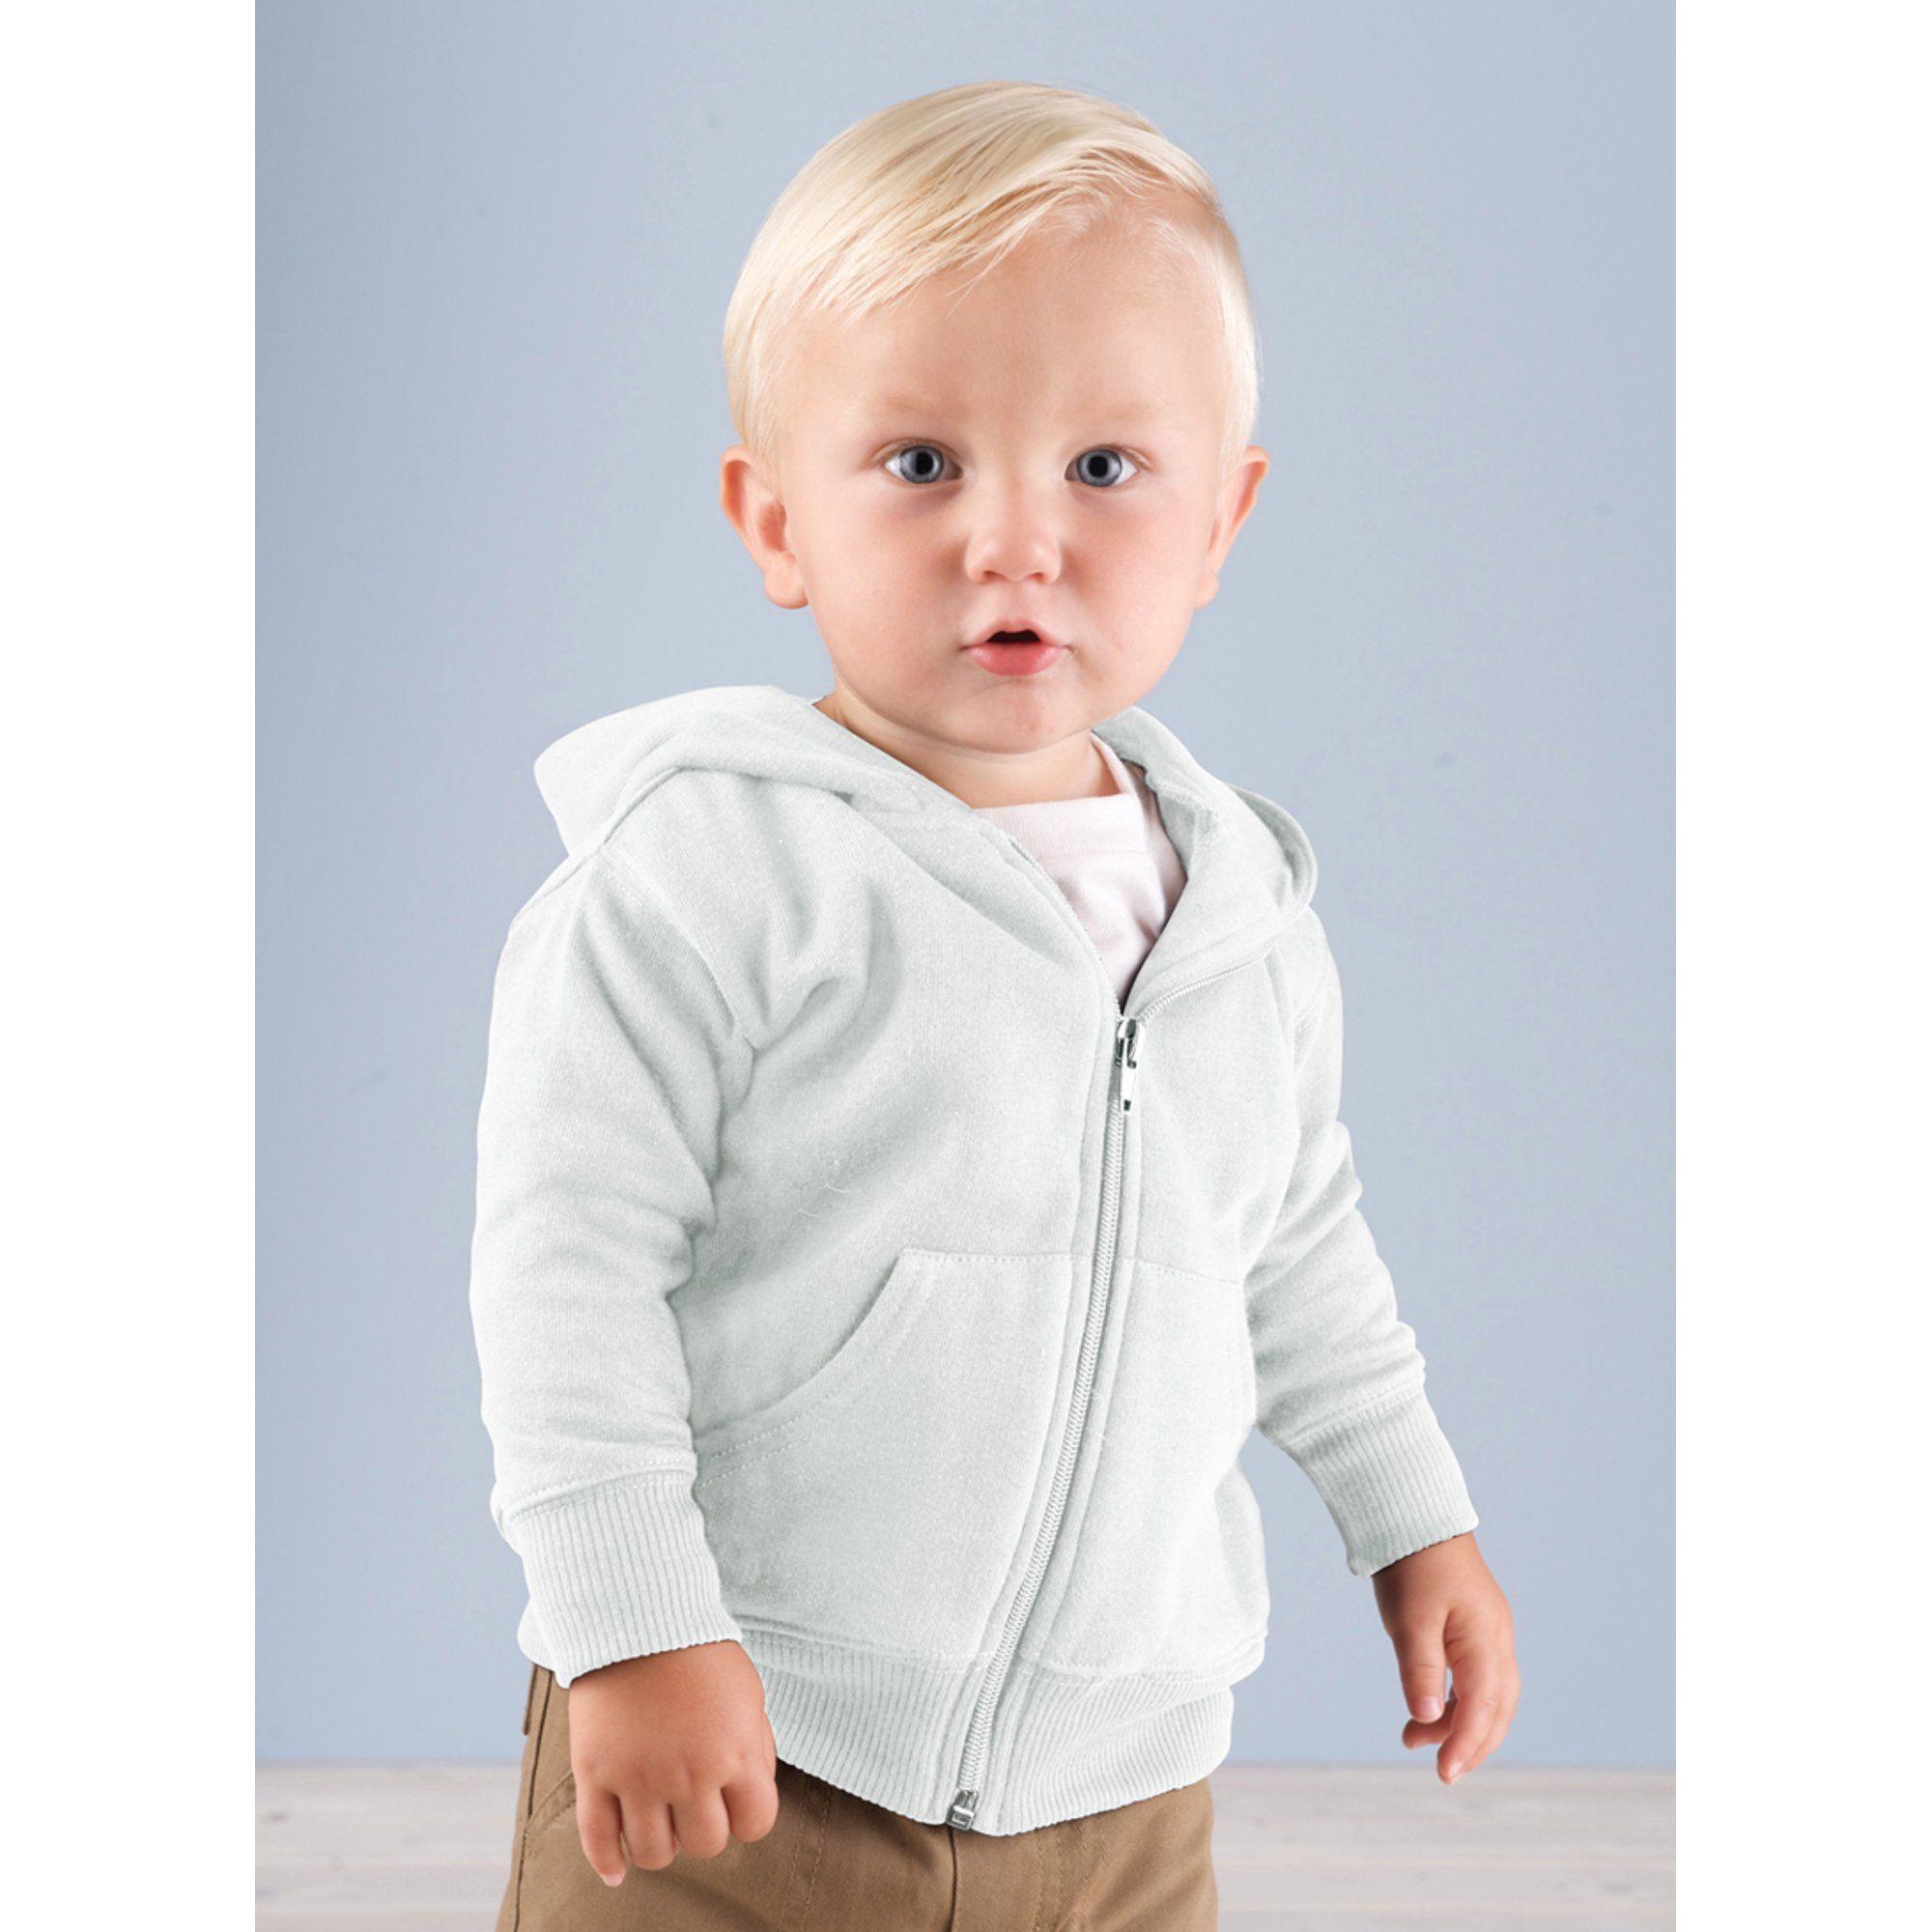 Rabbit Skins Price Each Rabbit Skins 3446 Infant Zipper Hoodie White 6m Walmart Com In 2021 Baby Sweatshirt Baby Hoodie Baby Boy Hairstyles [ 2000 x 2000 Pixel ]